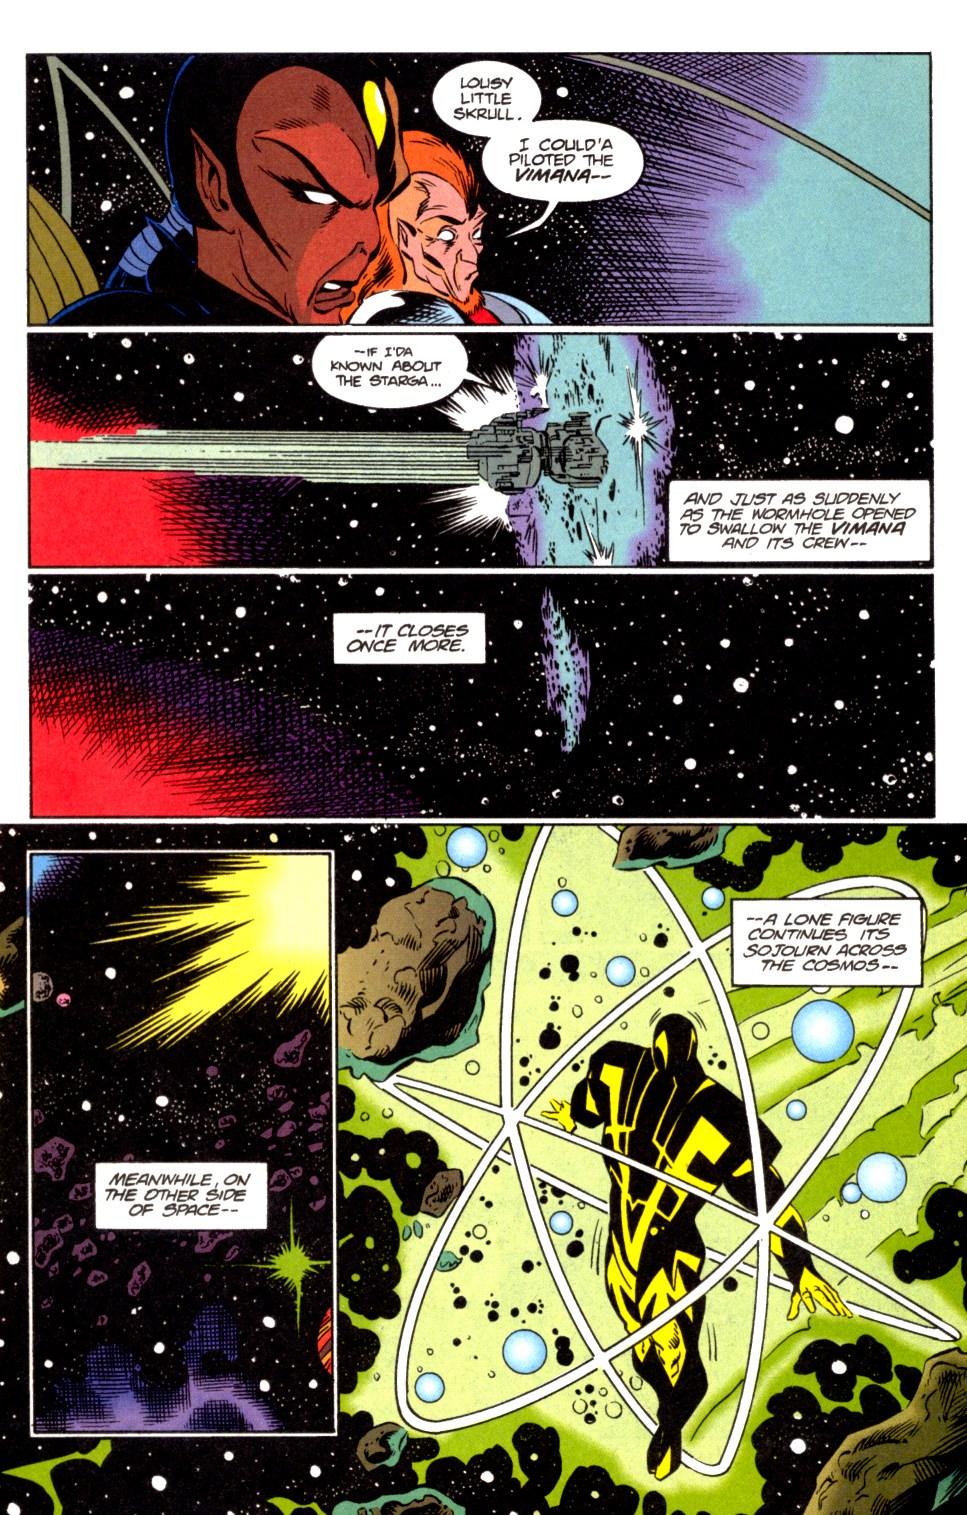 Read online Blackwulf comic -  Issue #6 - 14